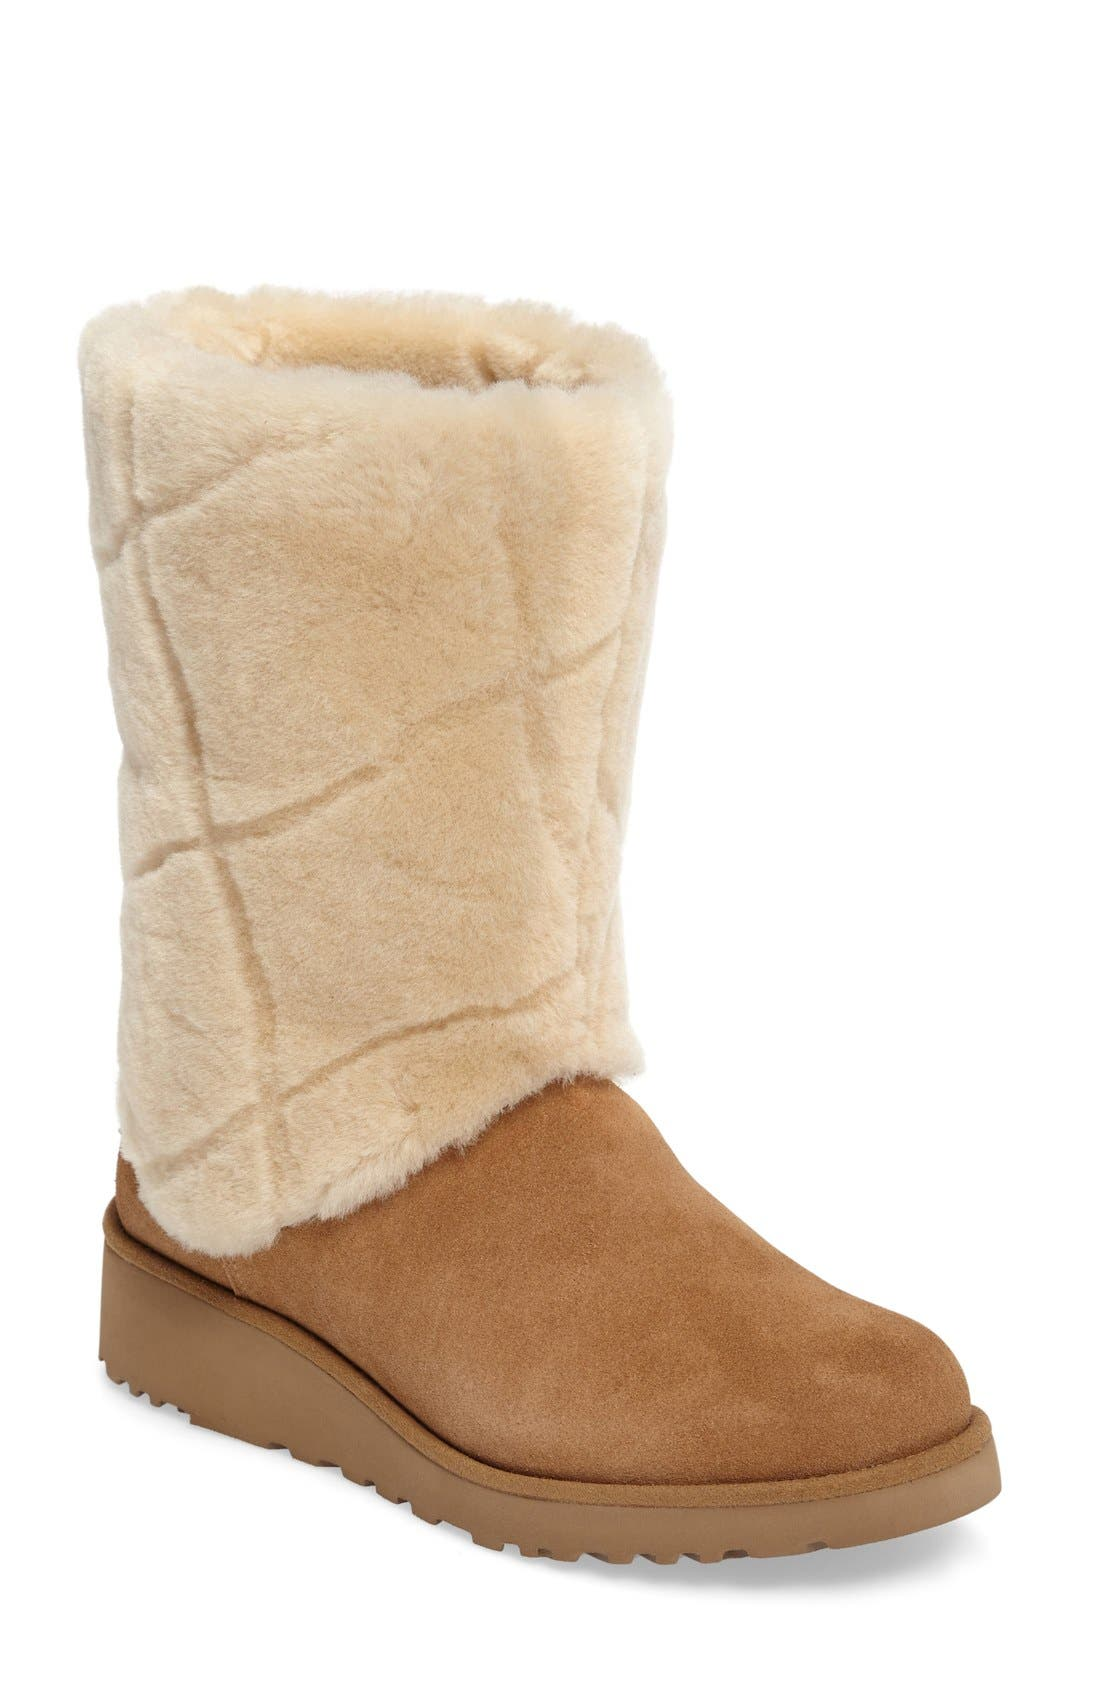 Main Image - UGG® Ariella Luxe Diamond Genuine Shearling Boot (Women)